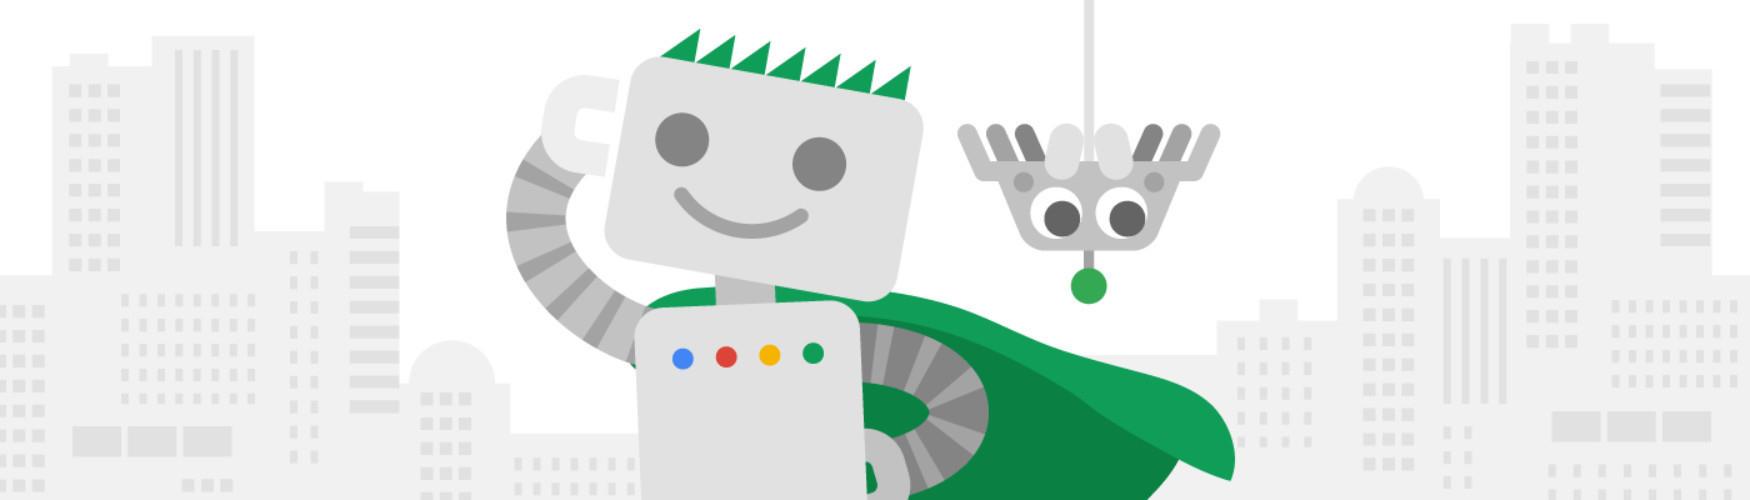 2020 Google Webspam report|鯊客科技SEO優化網頁設計公司